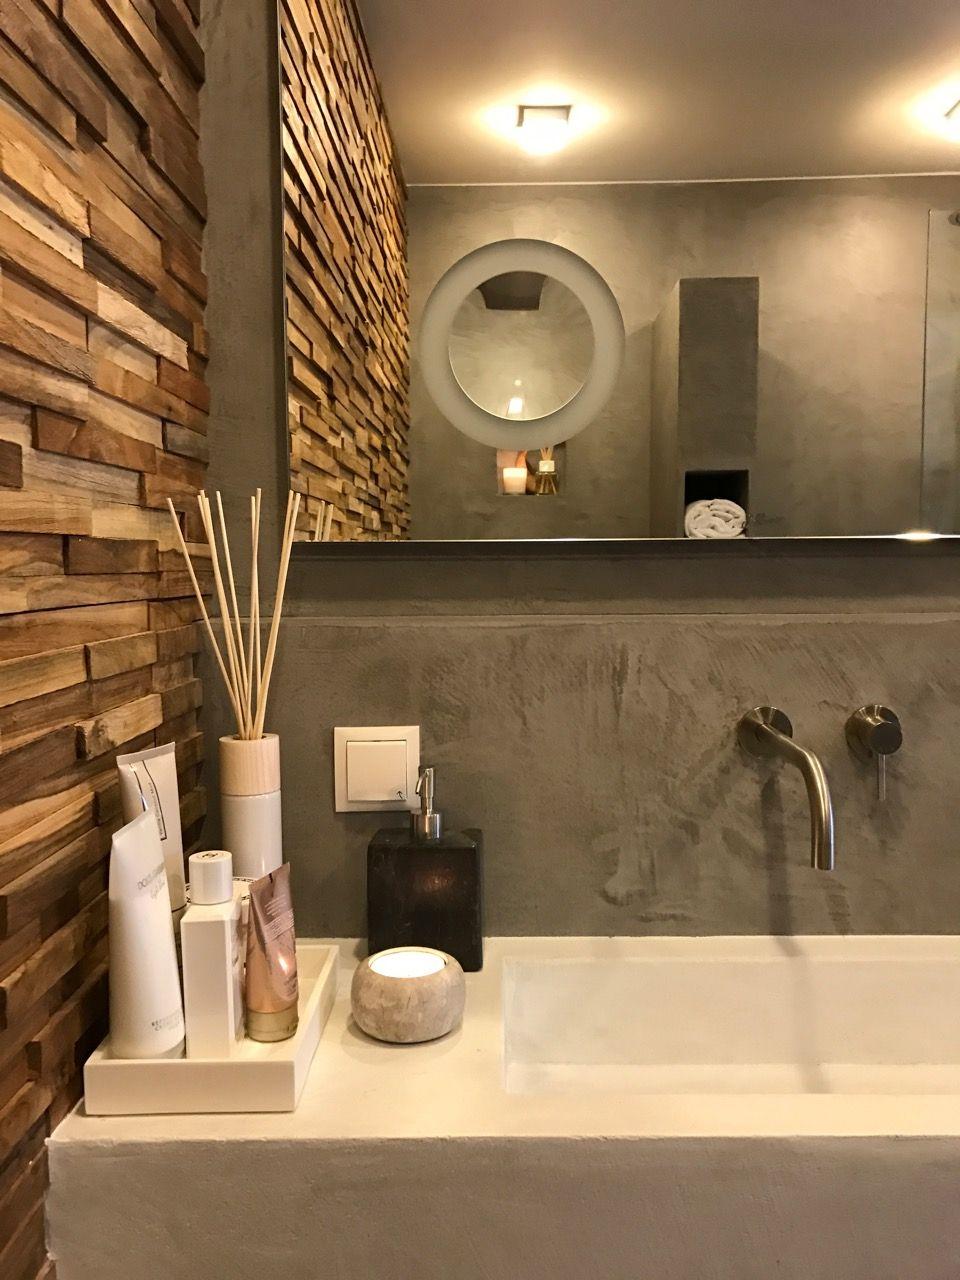 Hotel chique badkamer - Eigen Huis & Tuin | Bathroom ideas ...